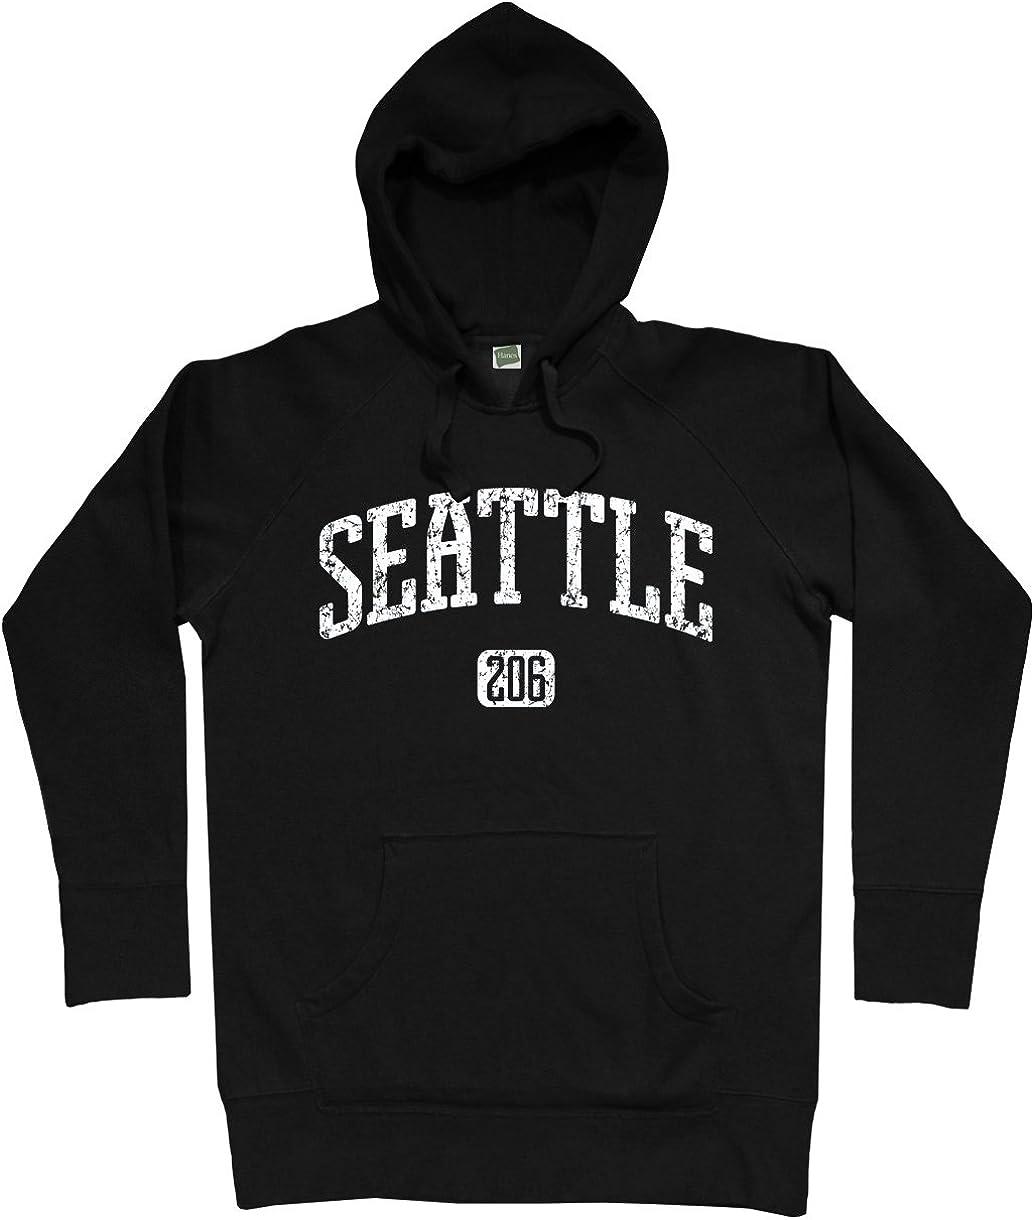 Smash Transit Men's gift Hoodie 206 Seattle In a popularity